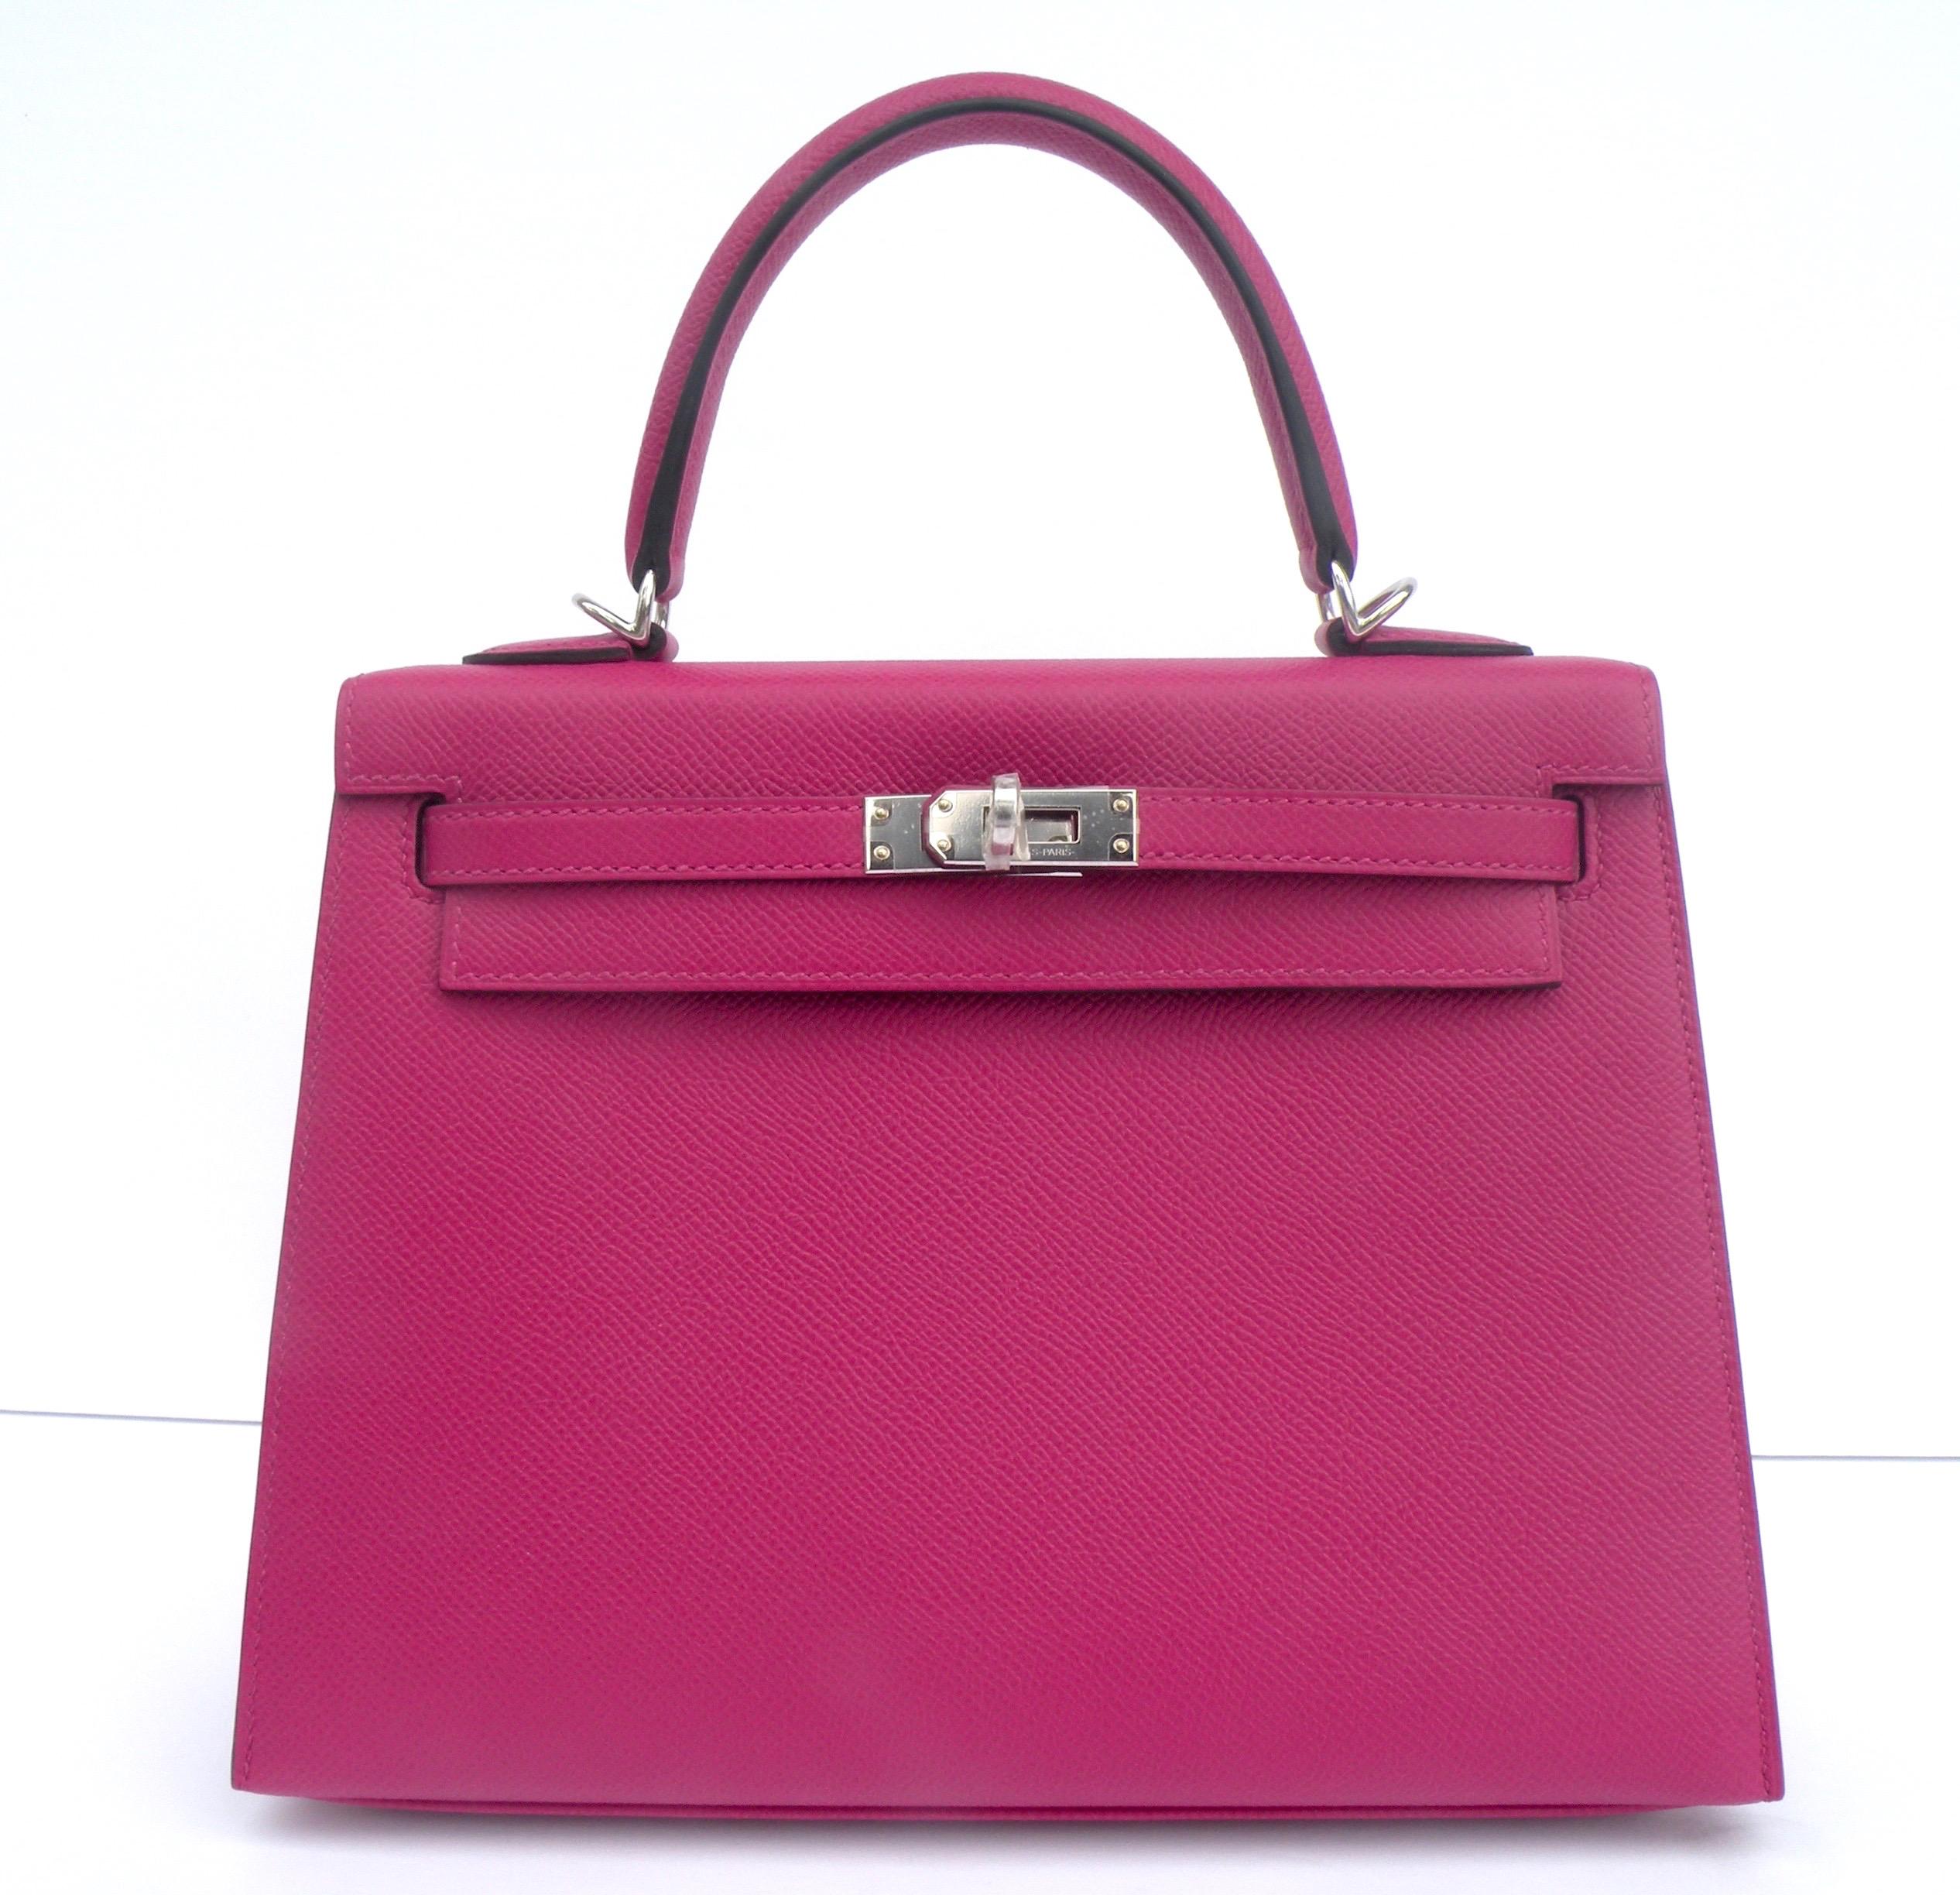 0c7dddfbe60 Discount Kelly Bag 25cm Rose Pourpre Pink Epsom Palladium Hardware ...